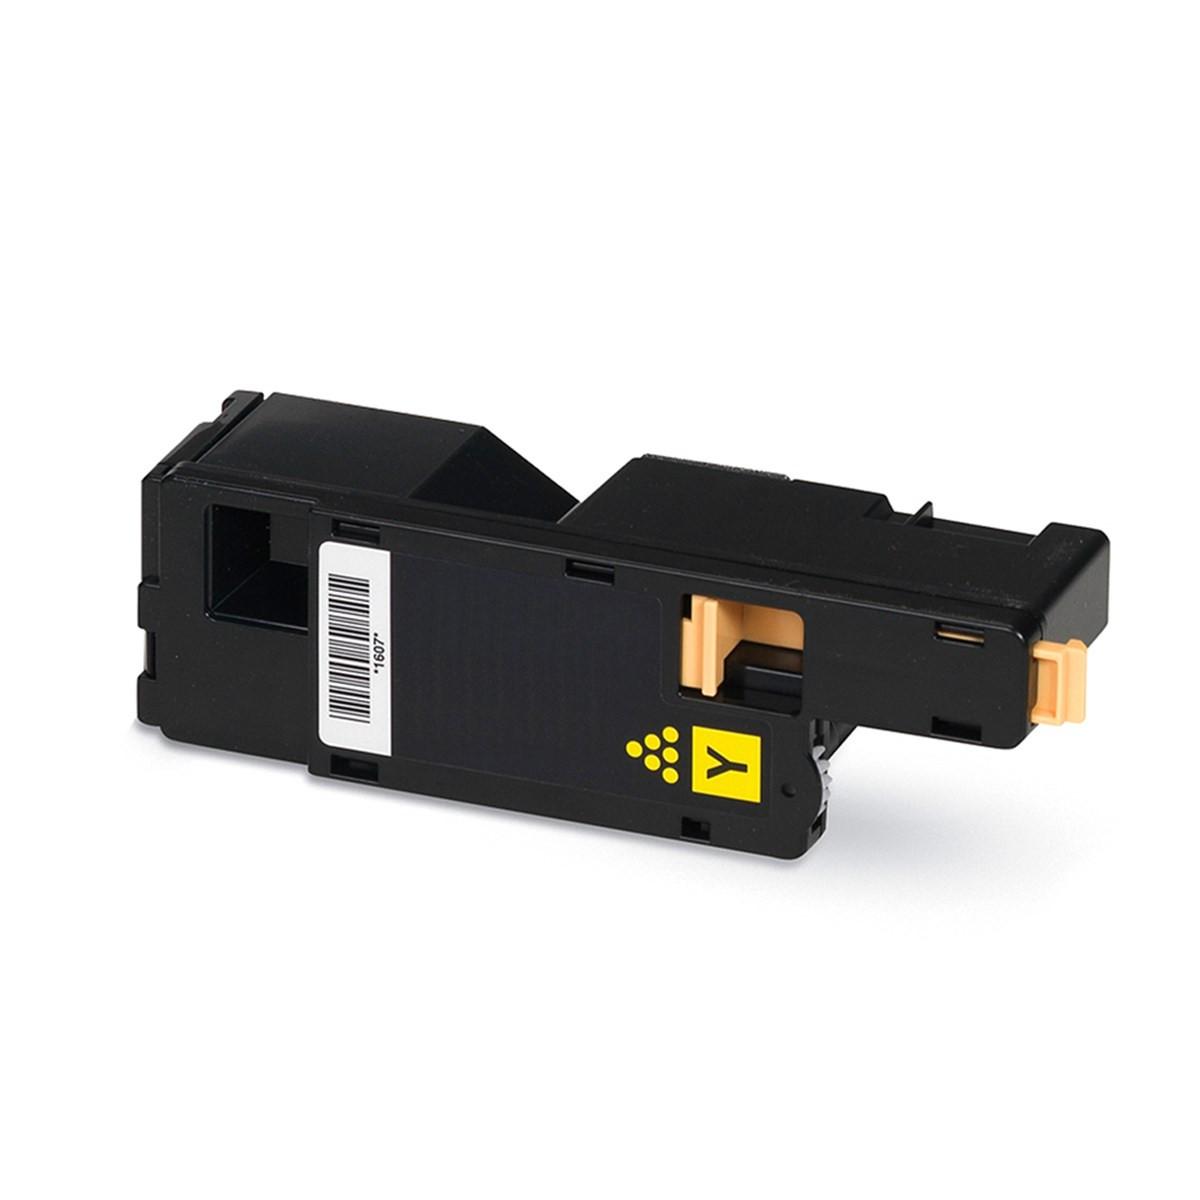 Toner Compatível Xerox Phaser 6000 6010 6015 | 106R01633 Amarelo | Premium 1k